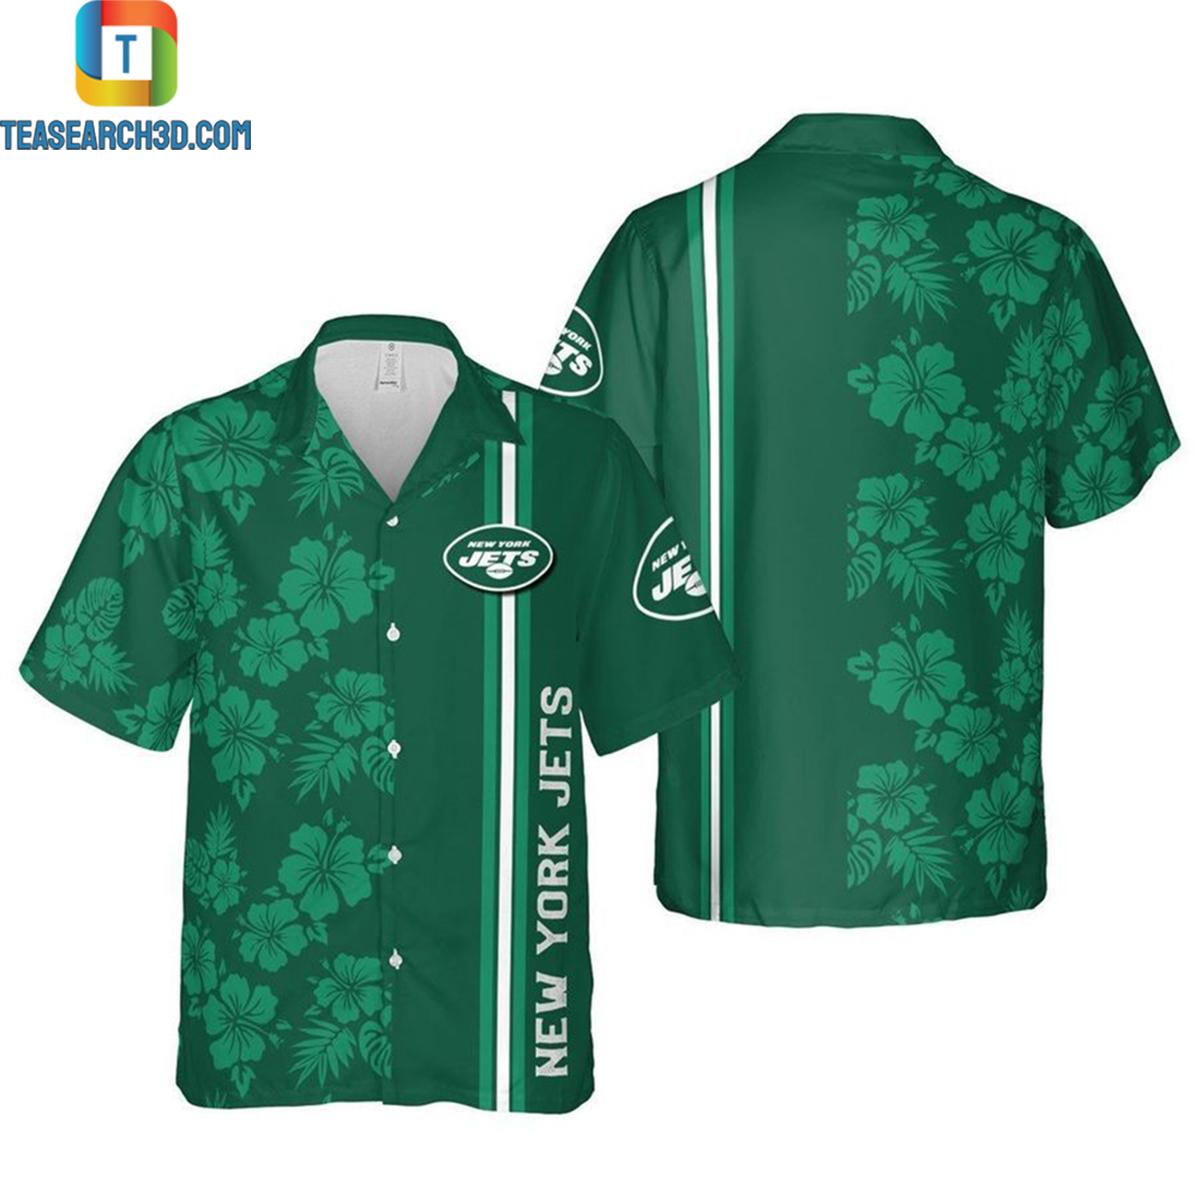 New york jets nfl football hawaiian shirt 2